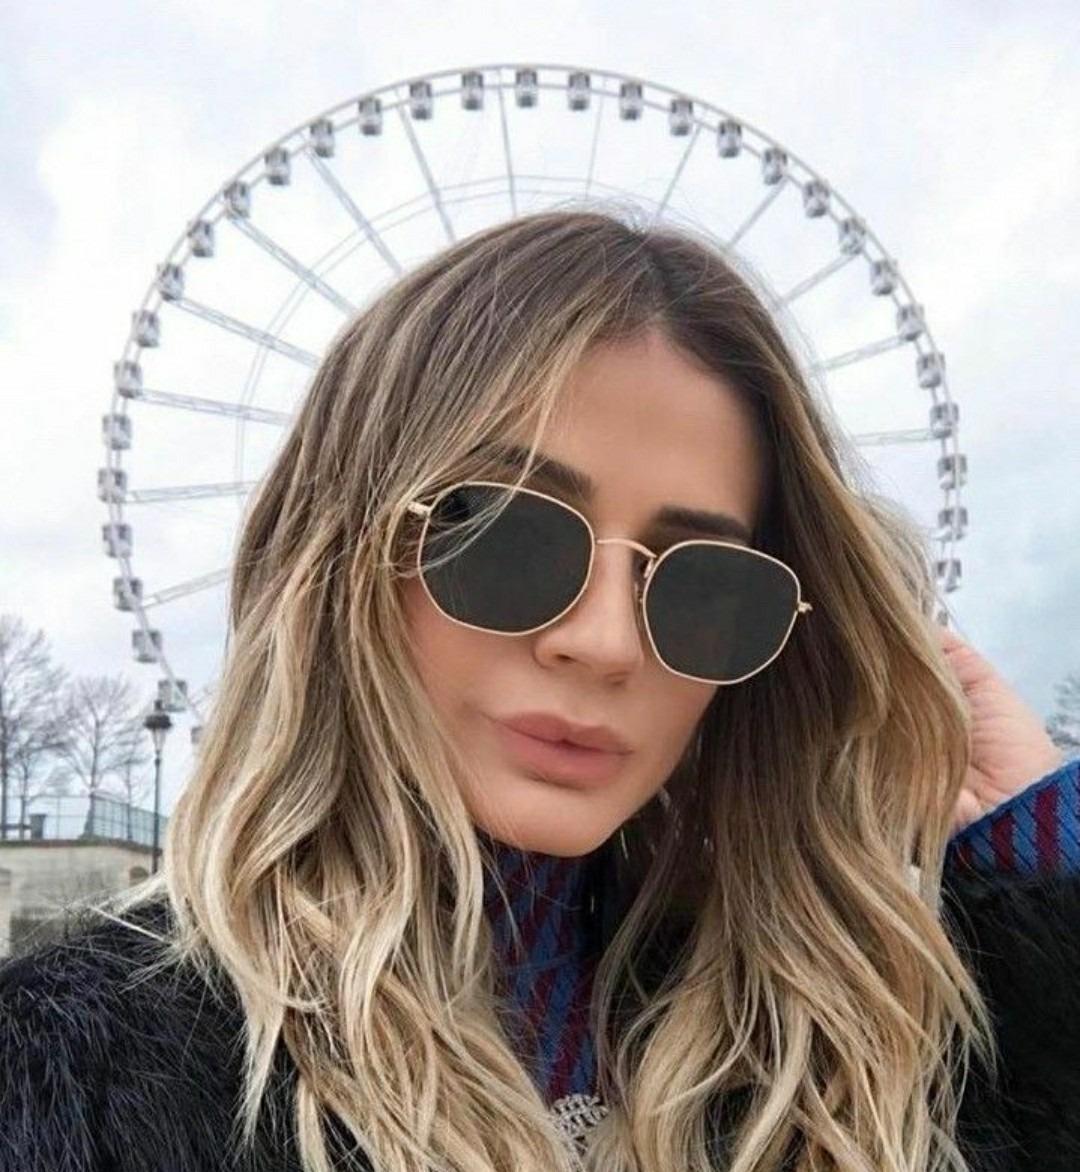 ae4363ea57e81 óculos feminino de sol escuro grande hexagonal 2019 + caixa. Carregando zoom .